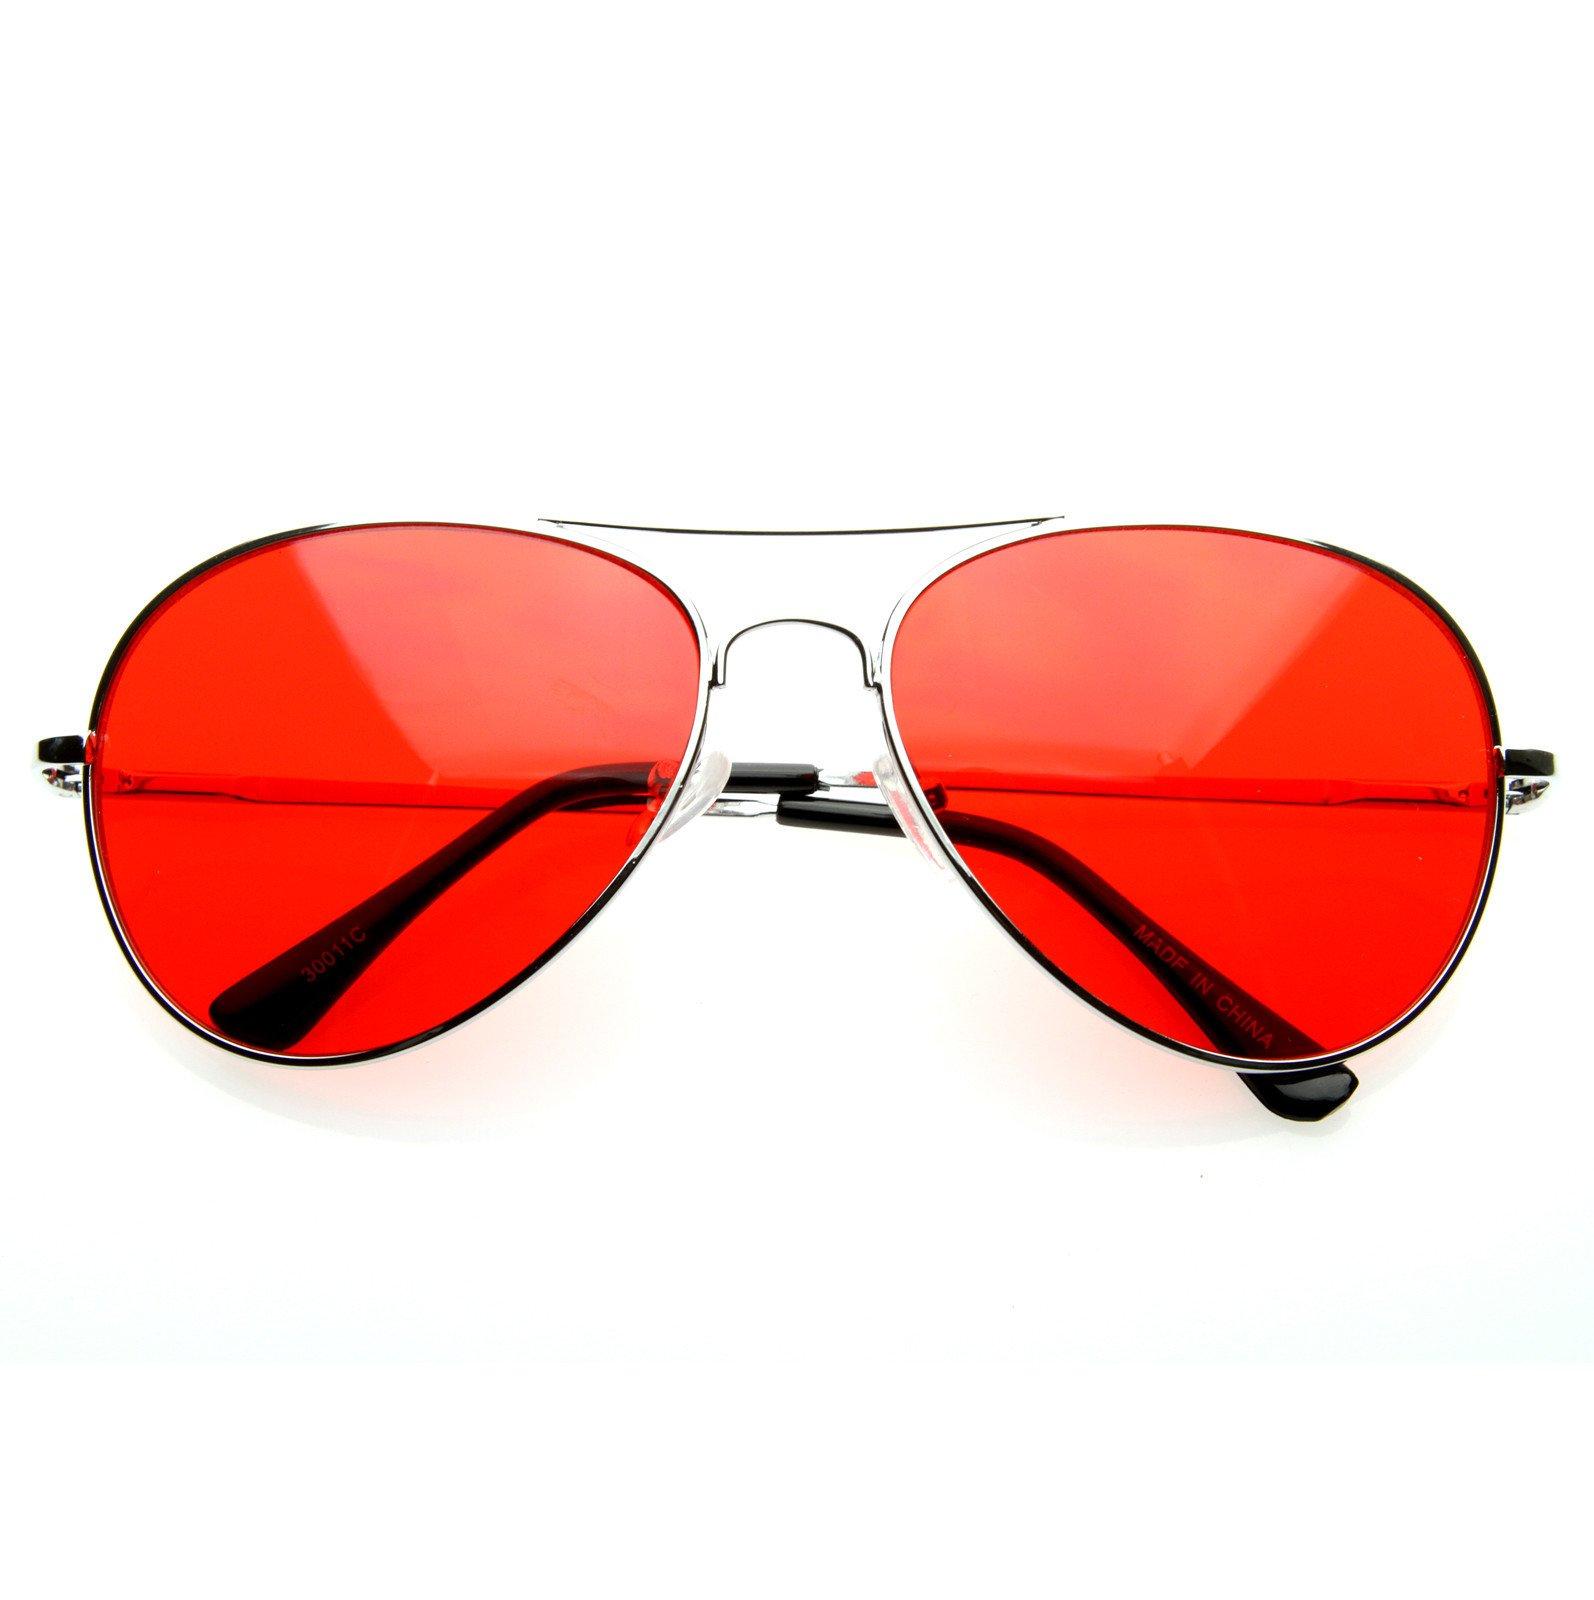 MLC EYEWEAR Retro Classic Aviator Ultra Red Tint Edition